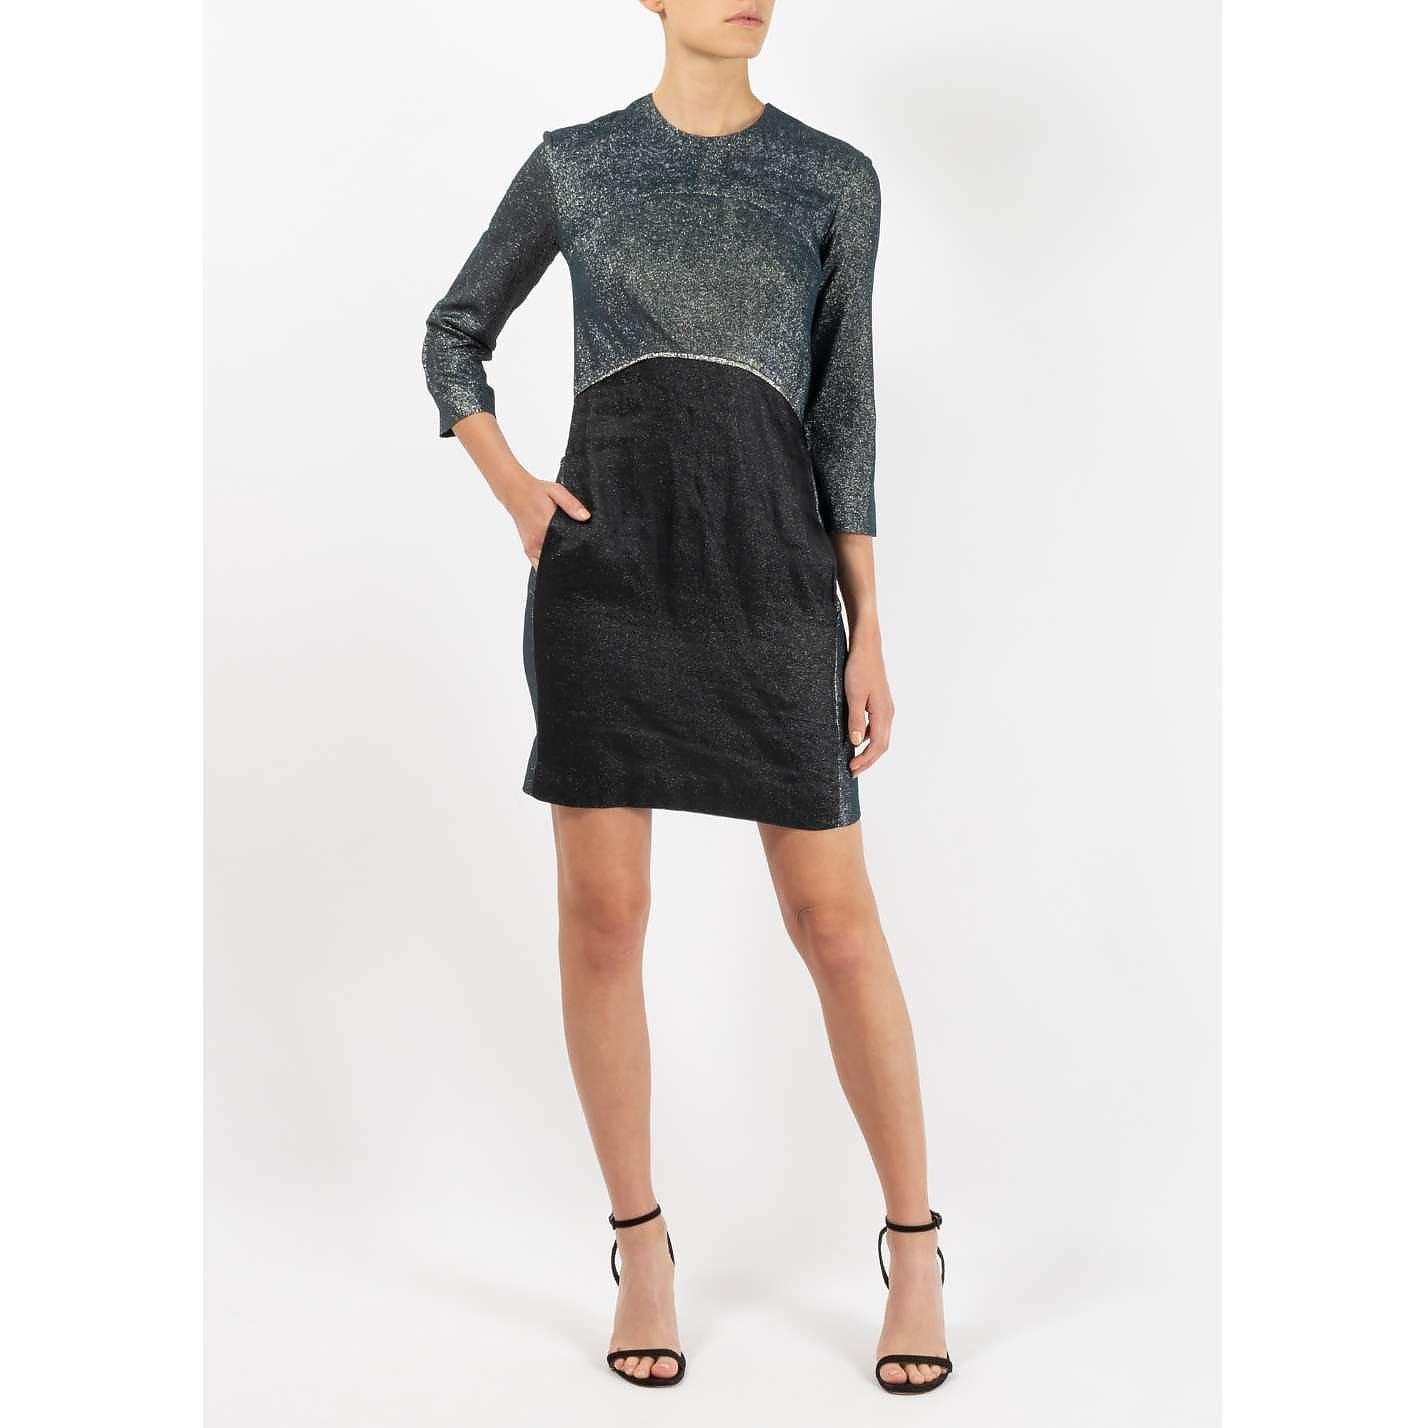 Victoria Beckham Metallic Mini Dress